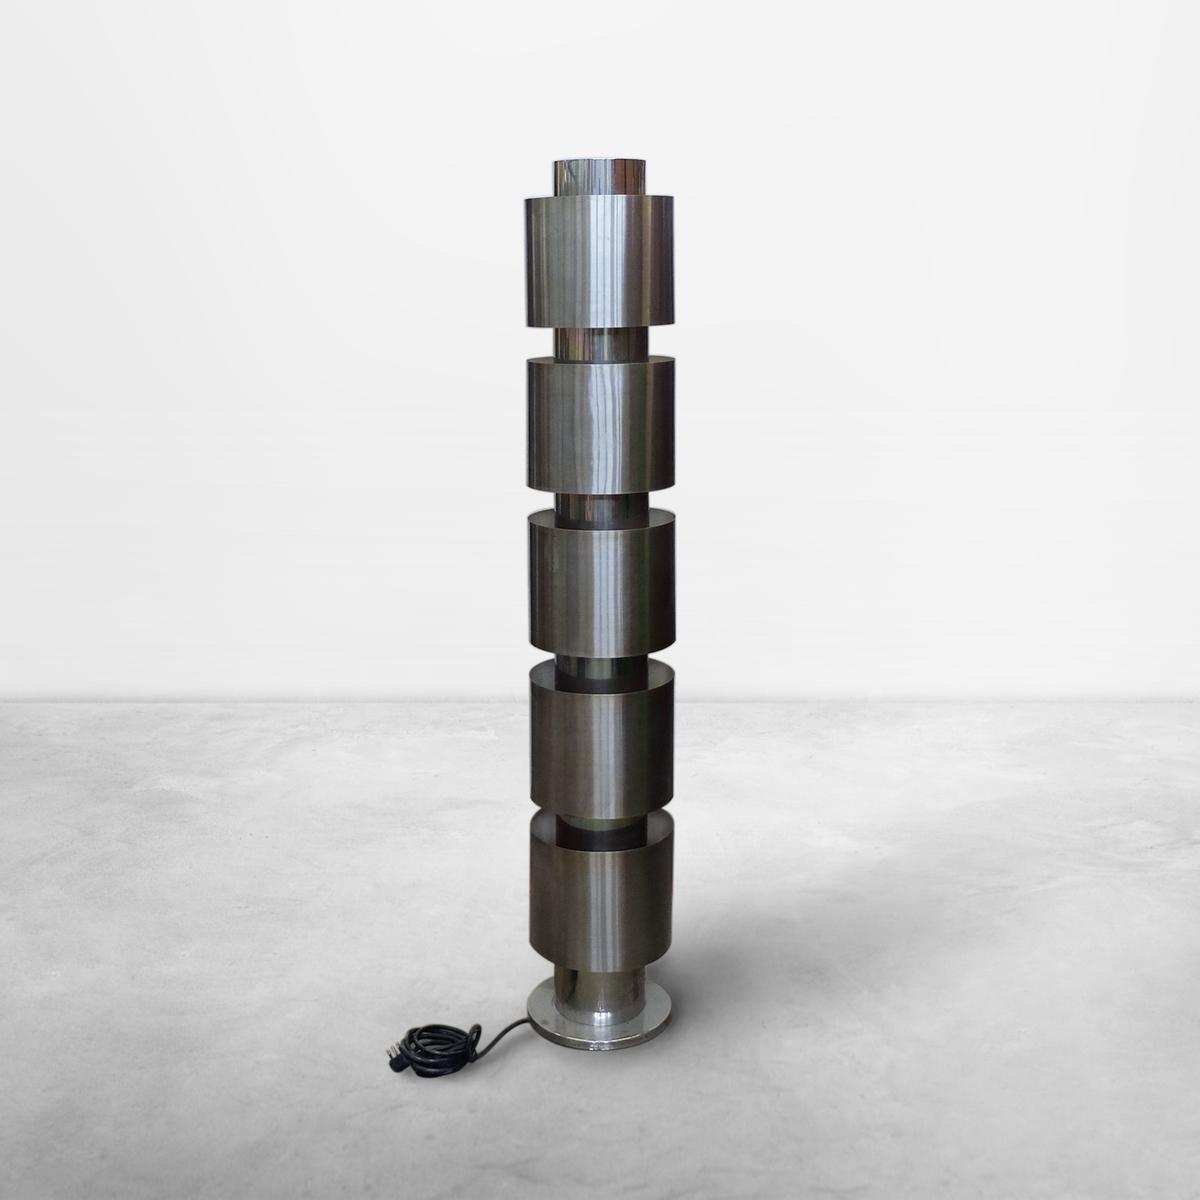 Italian Mid-Century Geometrical Chromed Metal Floor Lamp, 1970s